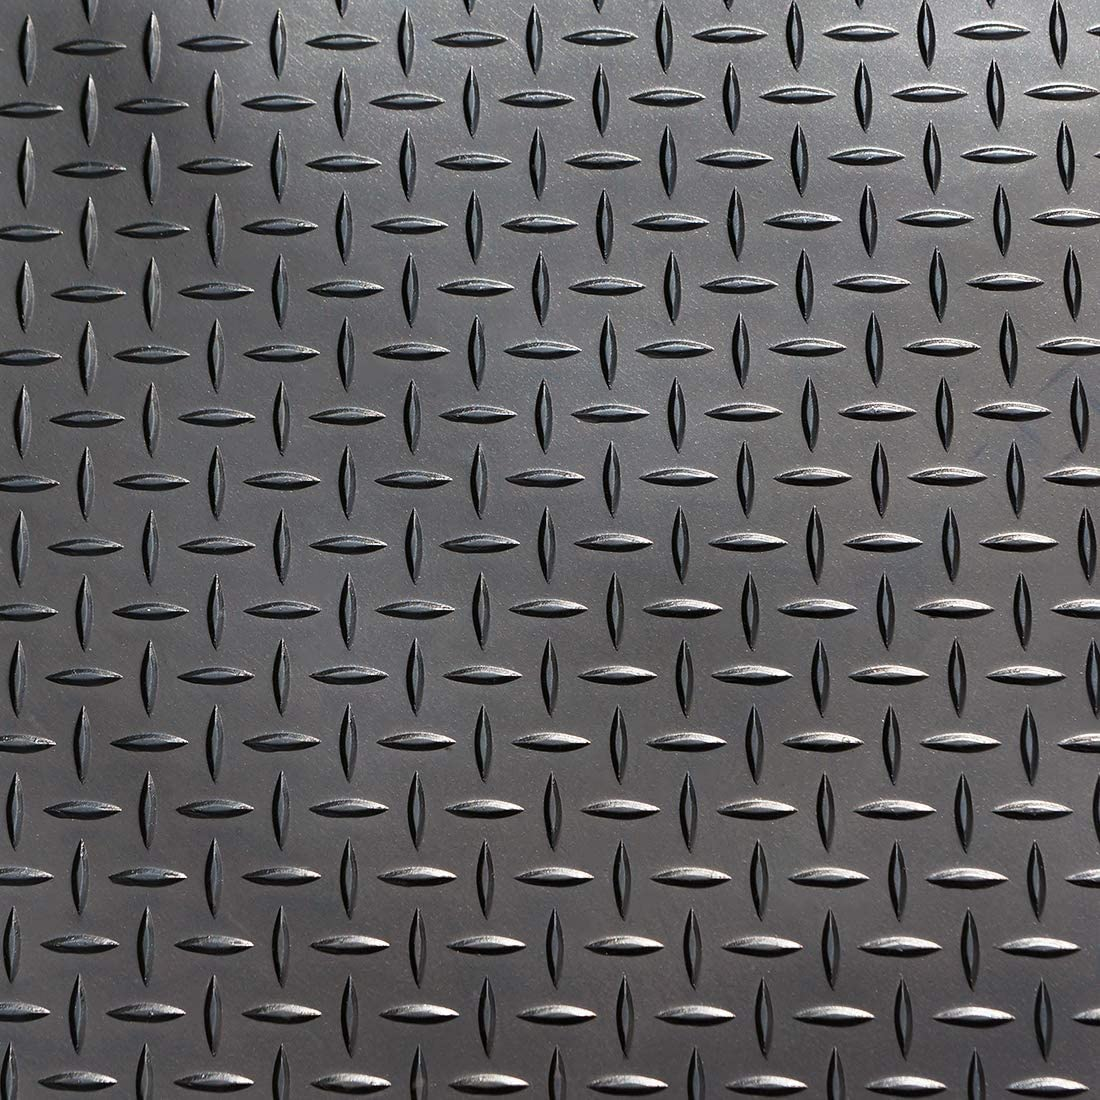 3mm 4m² Riffelblechmatte Gummimatte 1,50 x 2,67m